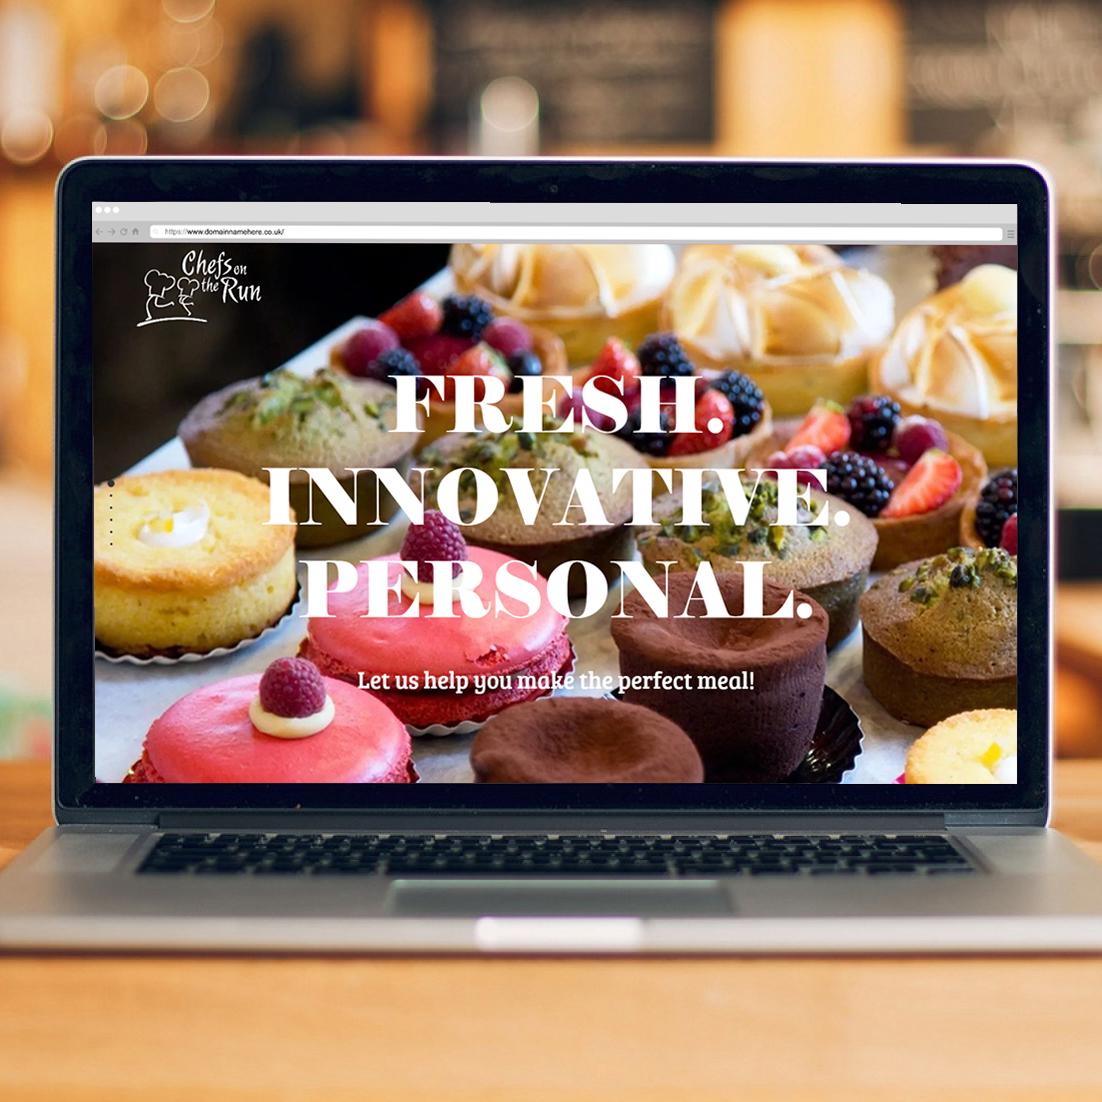 Pembrokeshire Web Designers for Chefs On The RunWeb Design Case Study